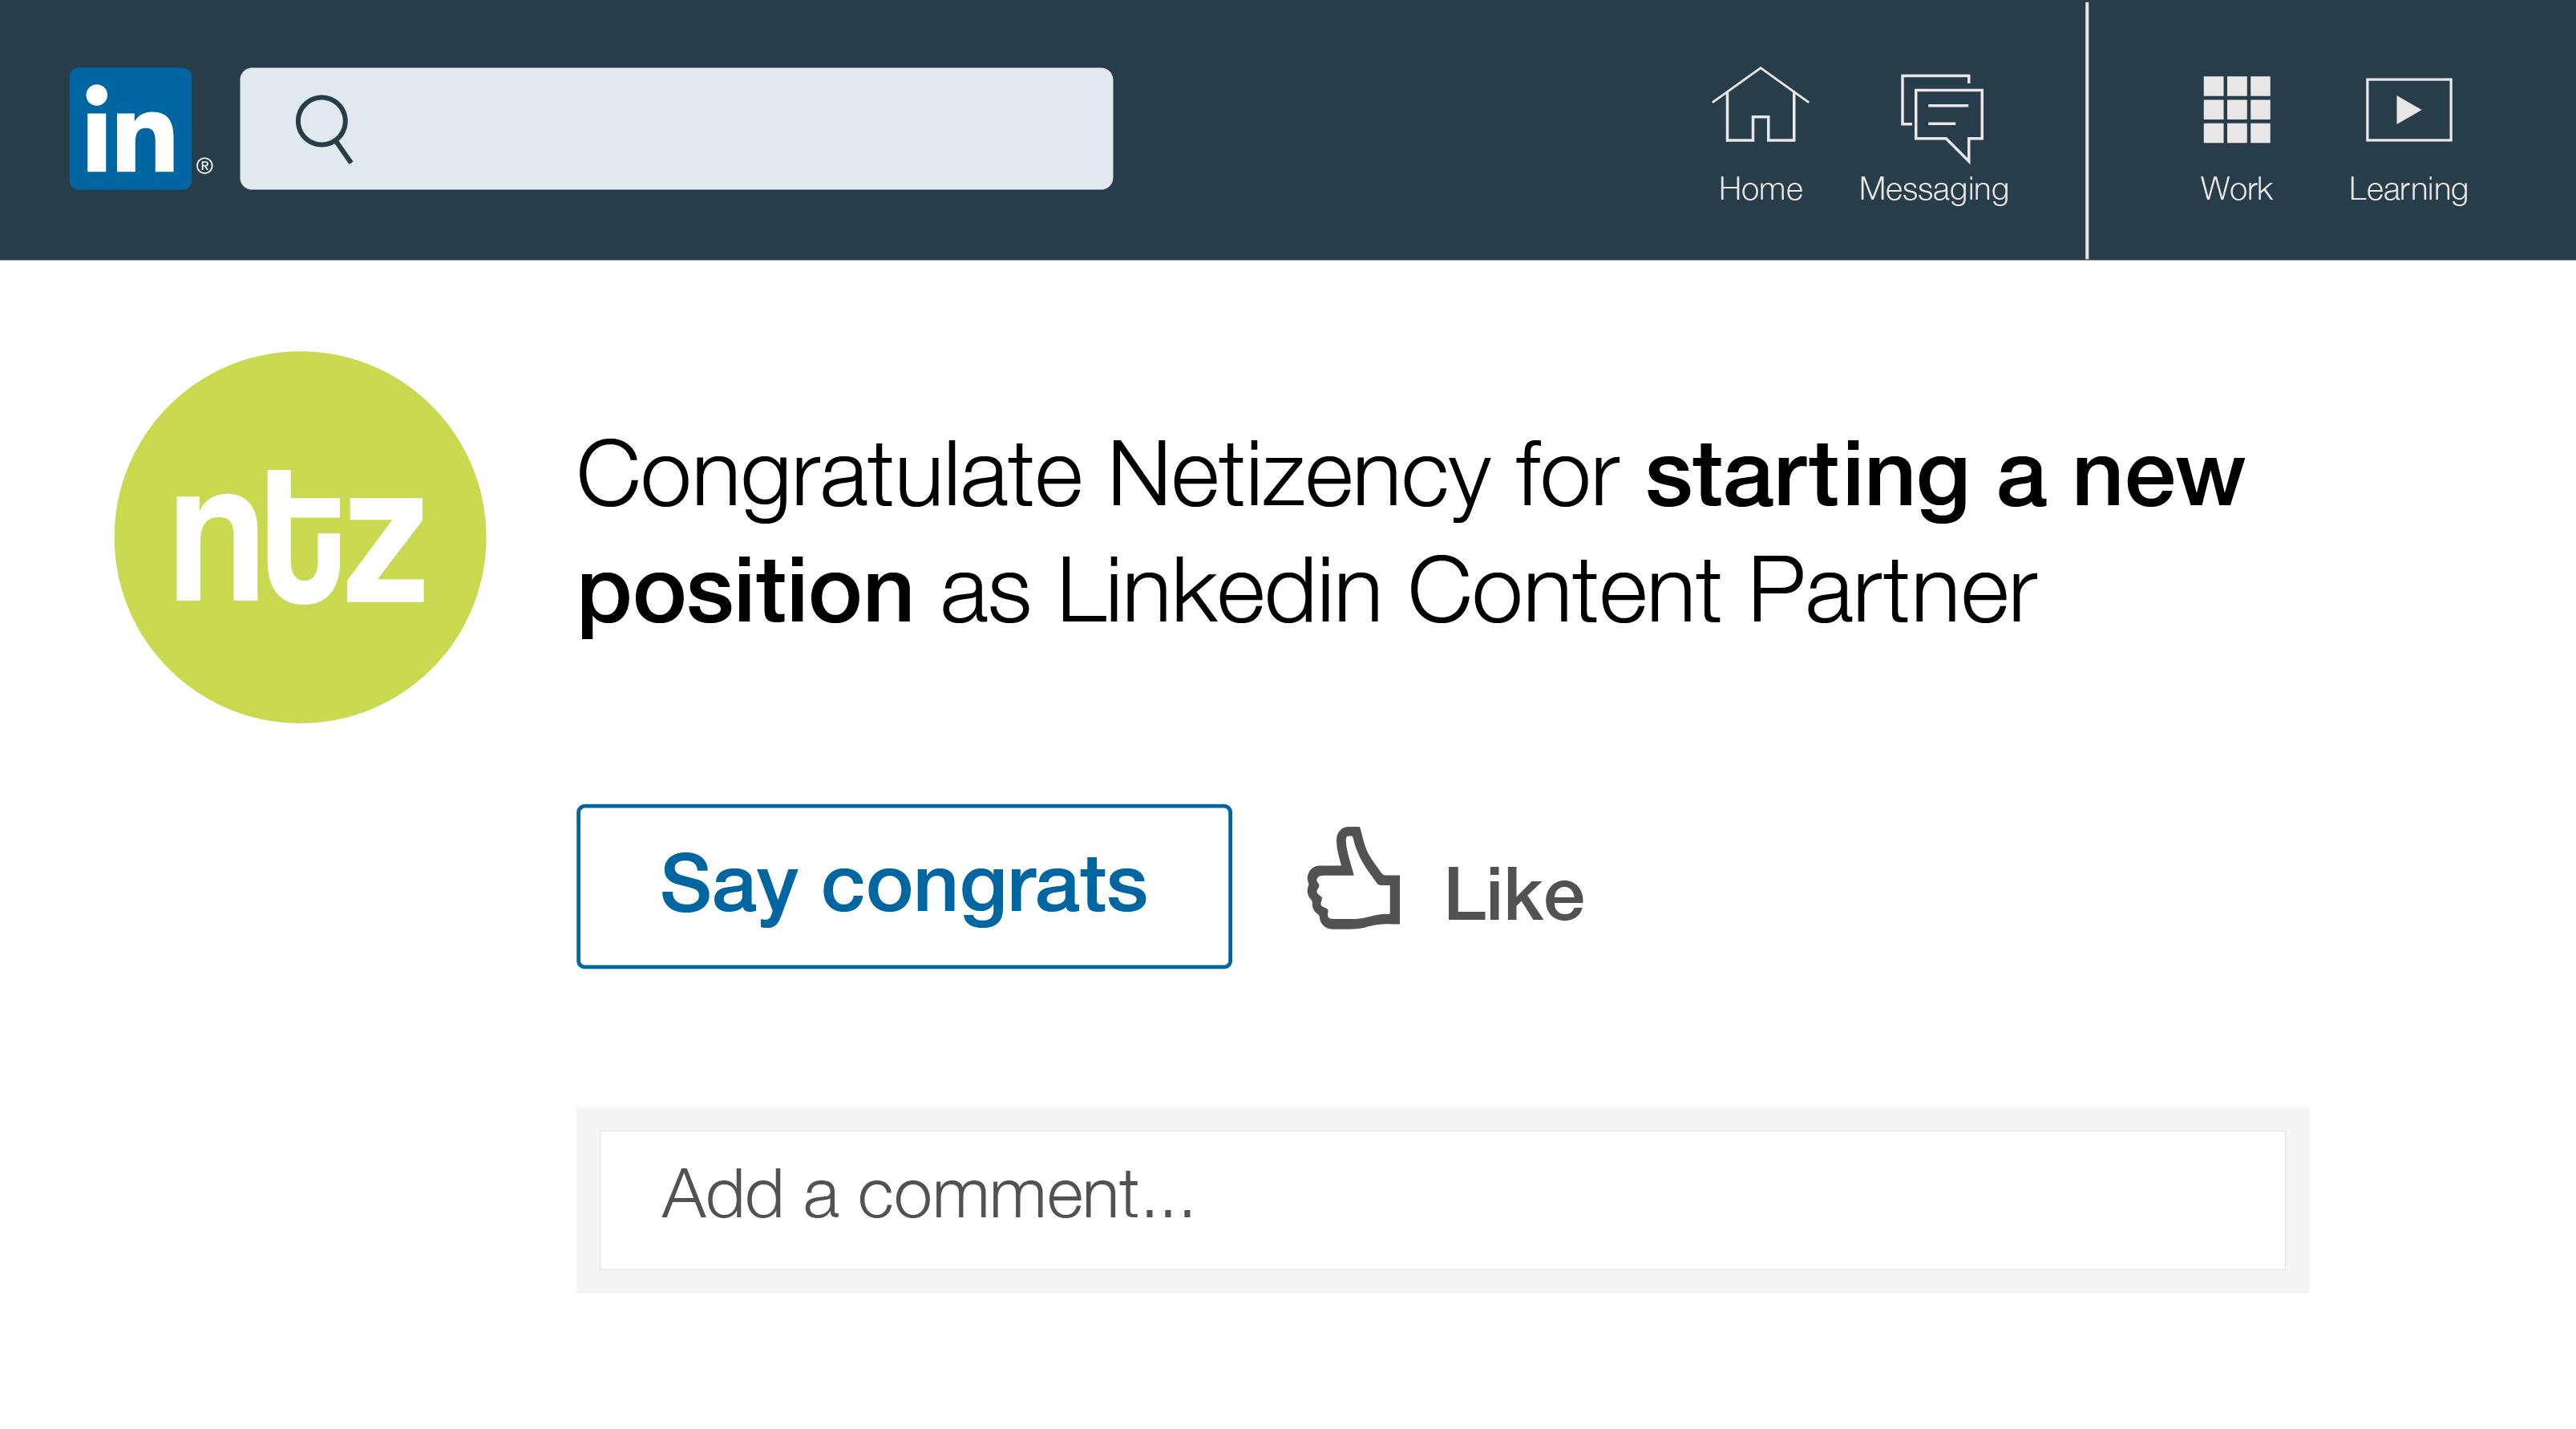 netizency-a-new-marketing-partner-for-linkedin